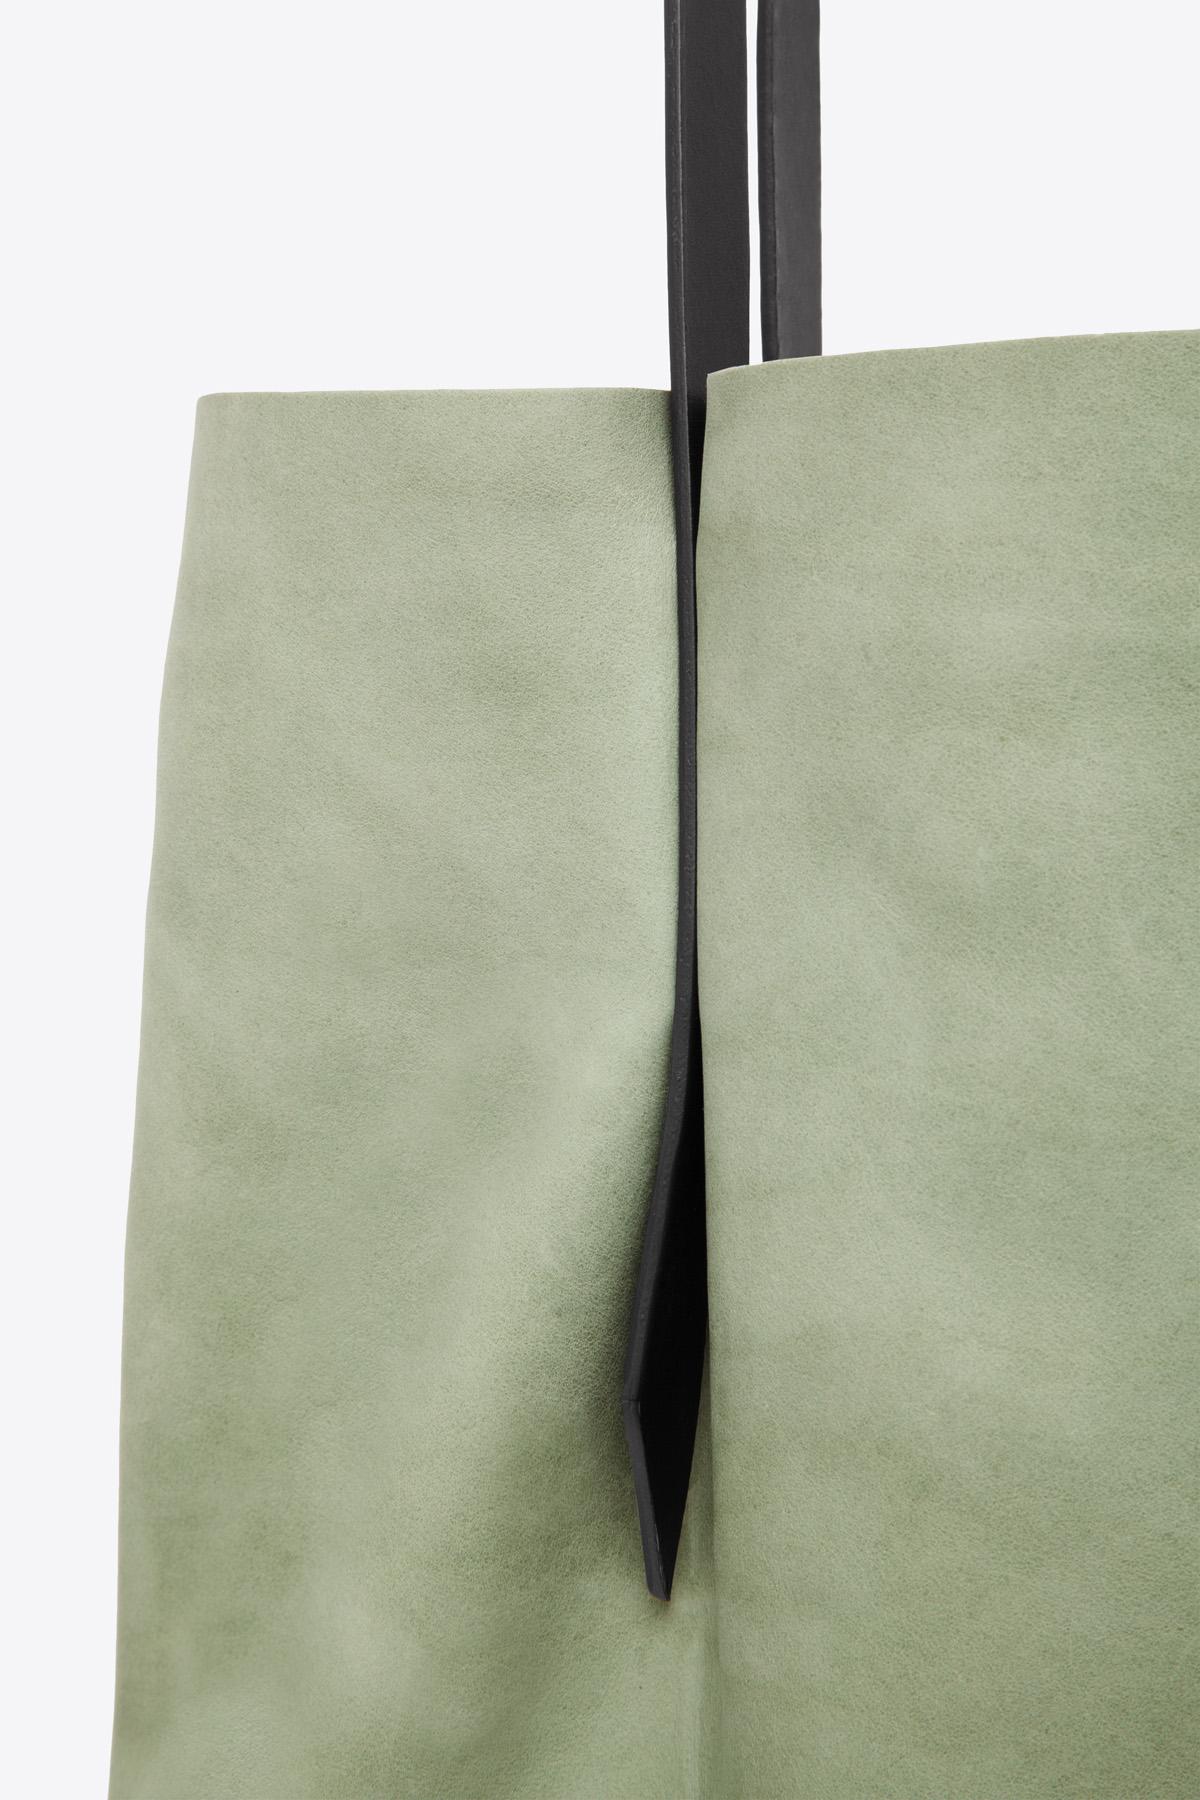 dclr006-shoppingbag-a9-jadegreen-detail